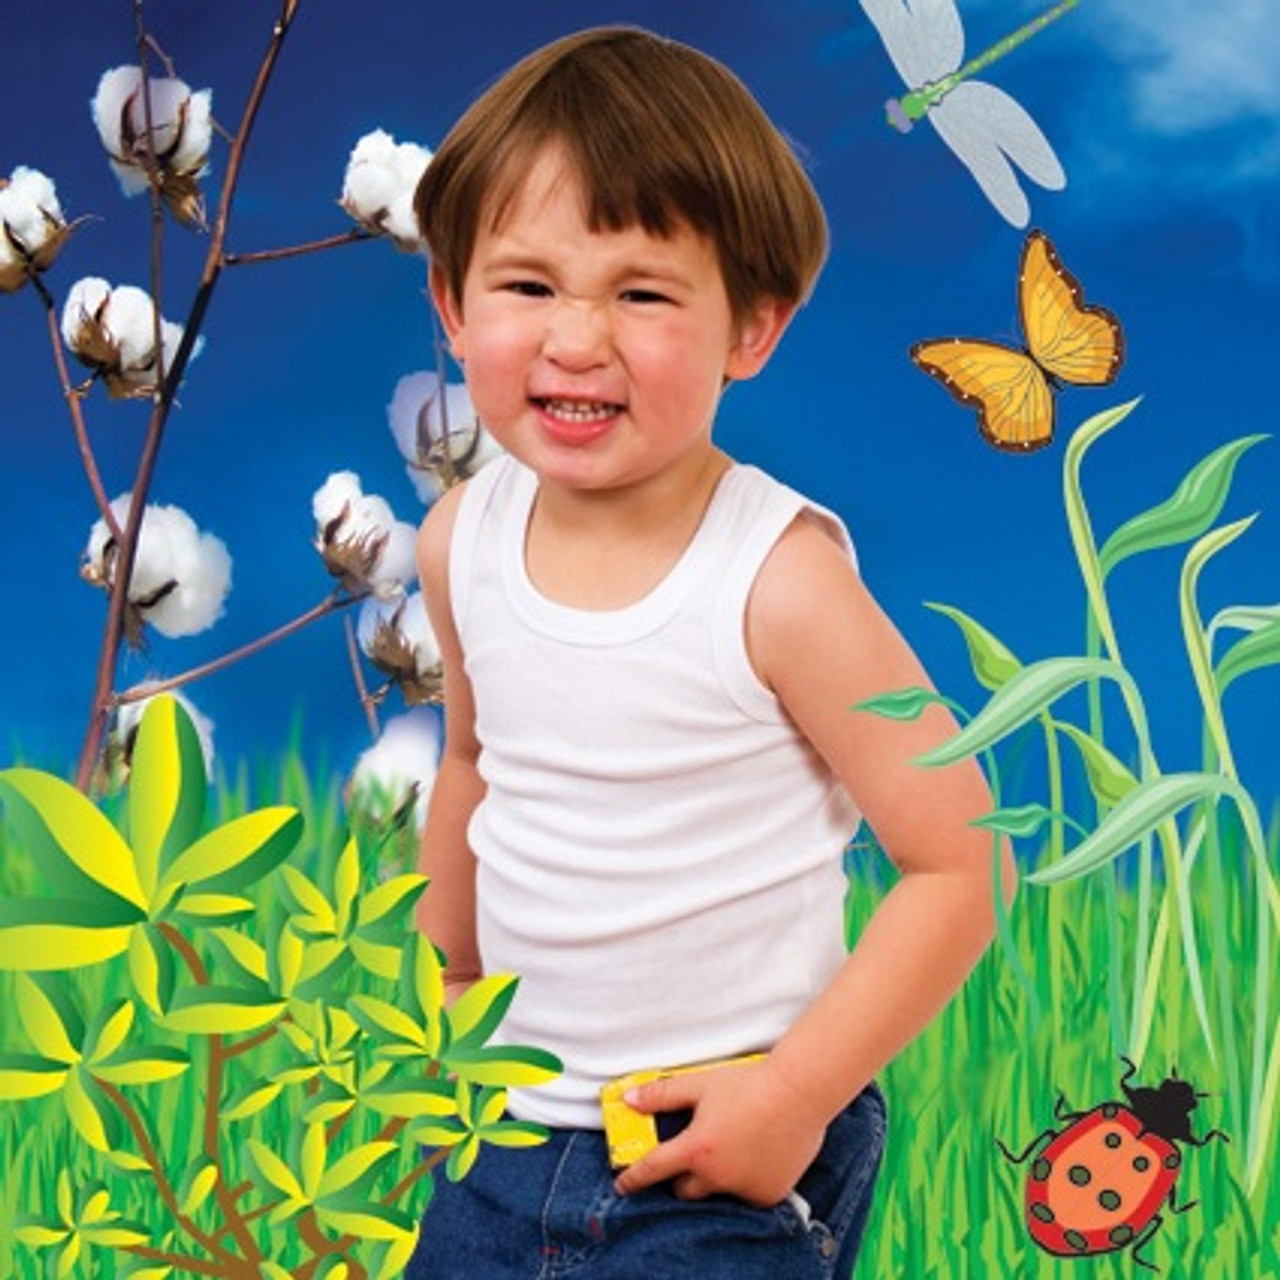 Baby Hoodie Blank Plain Kids Toddler Gift Boy Girl Clothes Black Lightweight